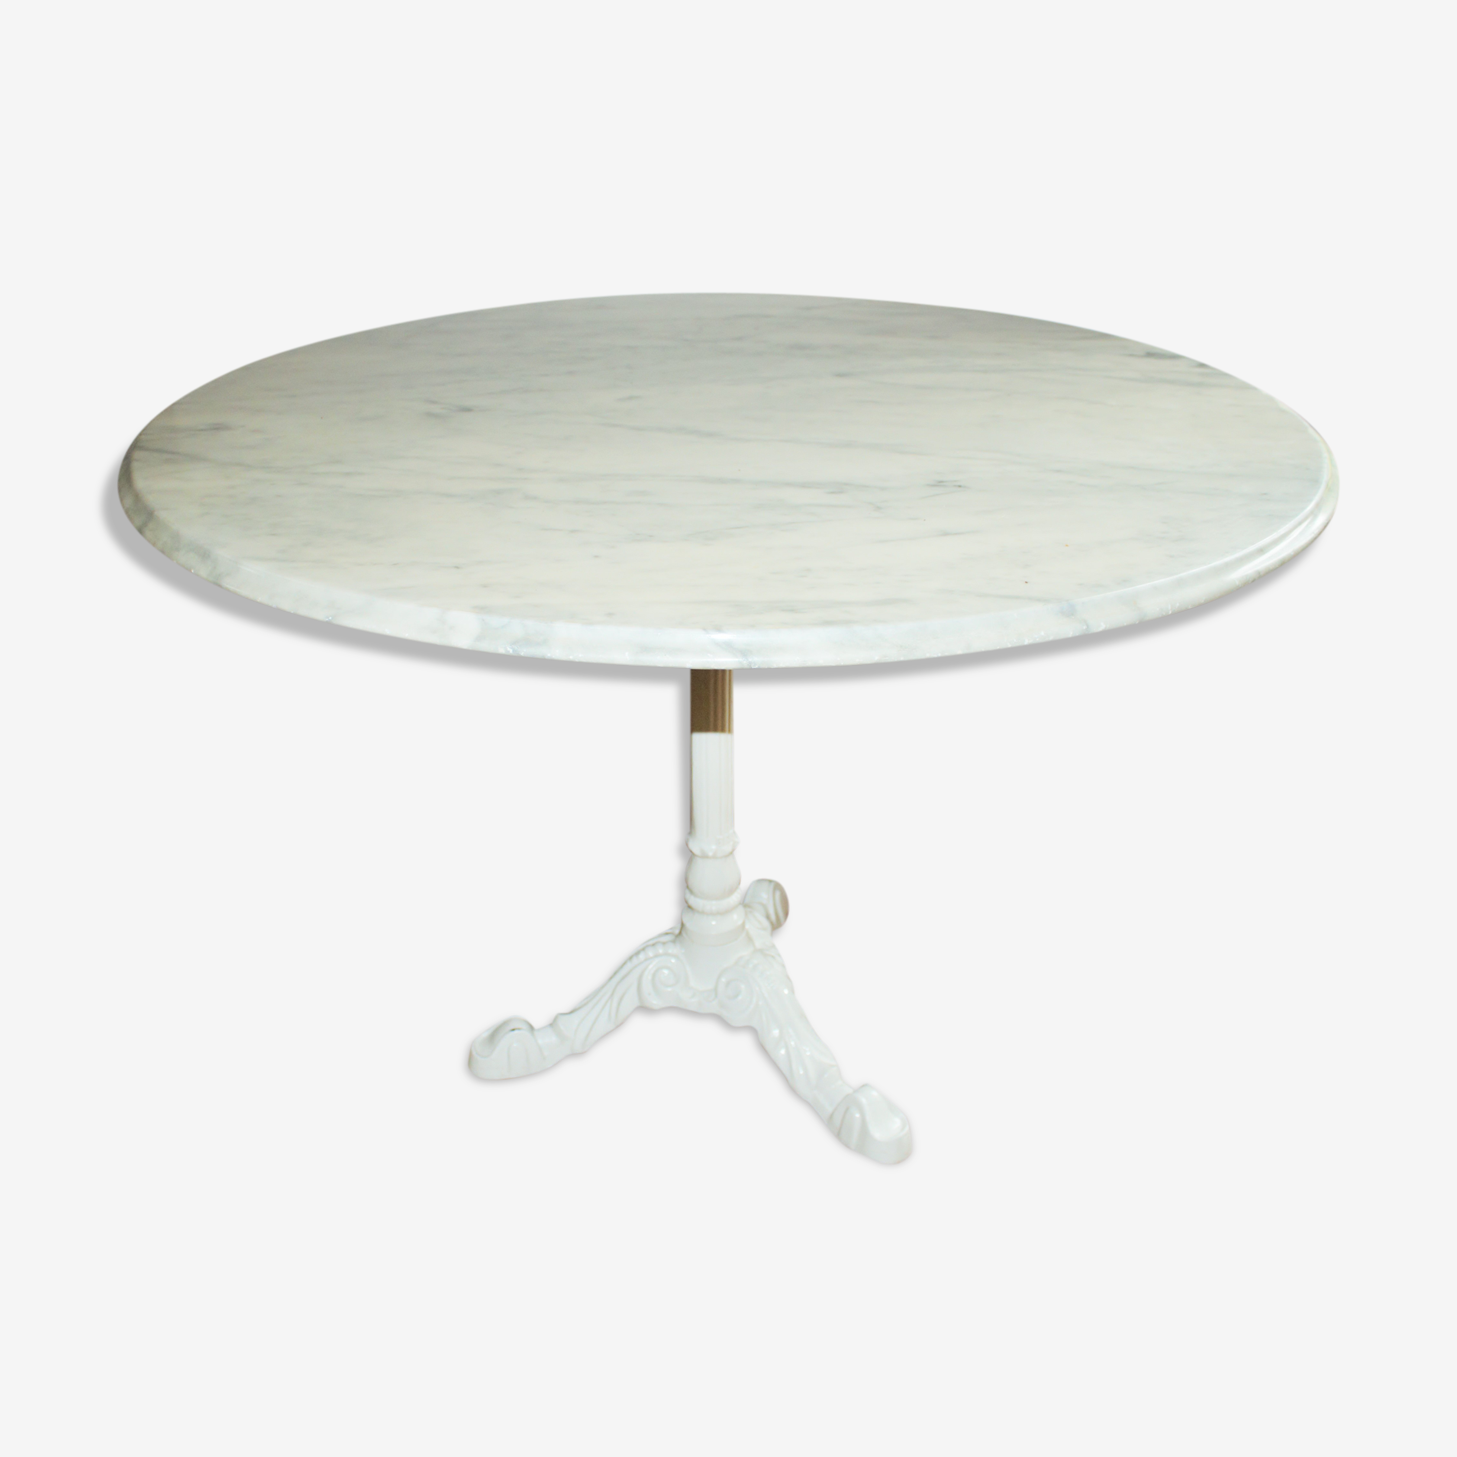 Table tray white marble round